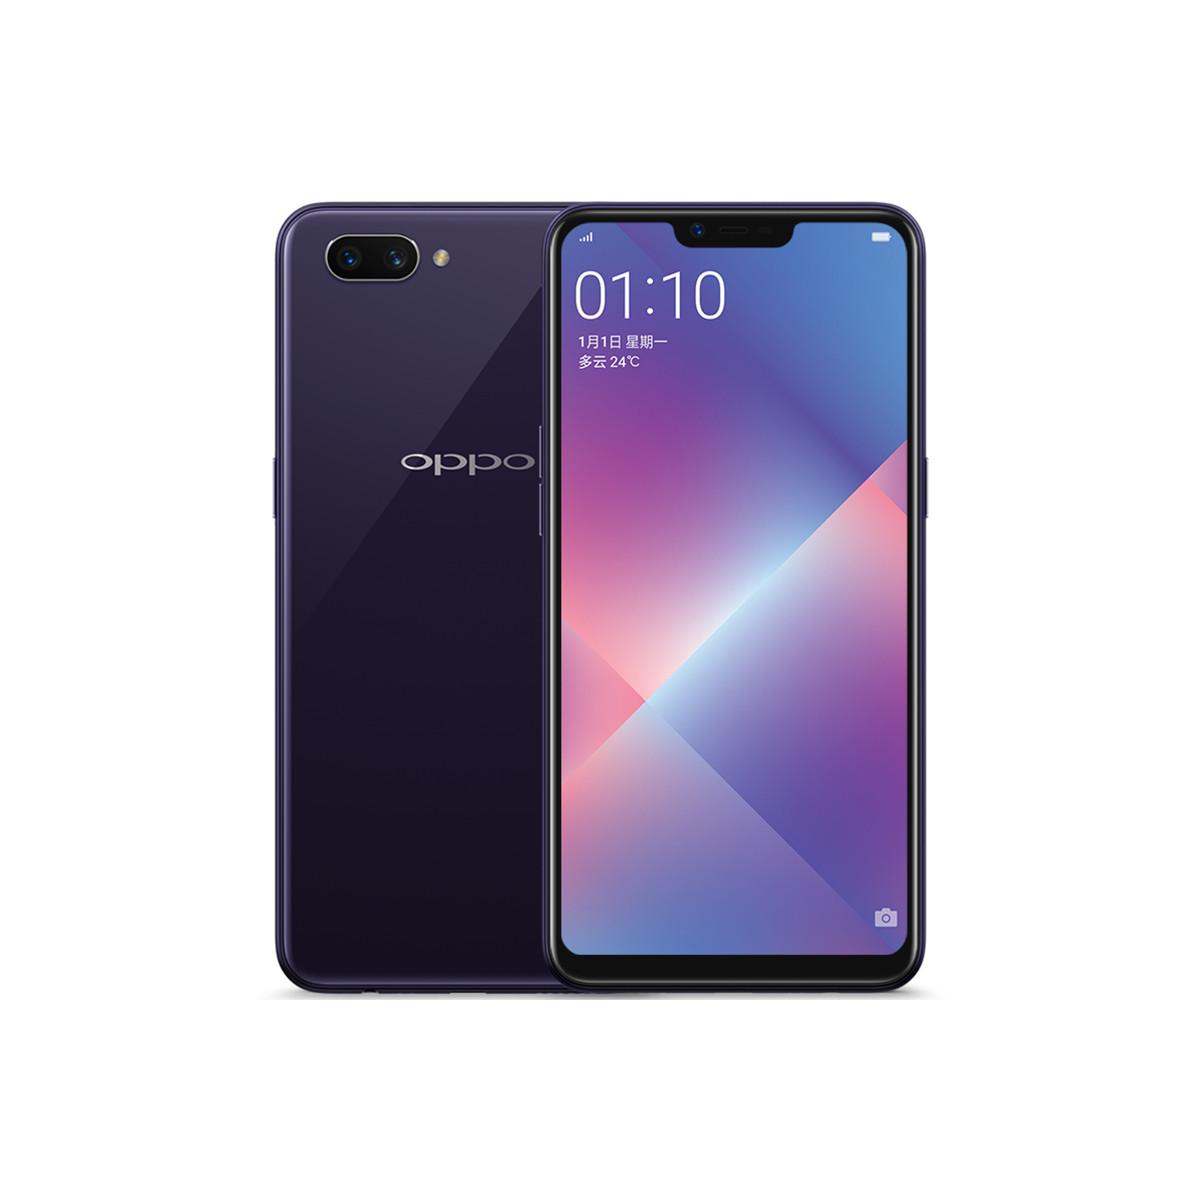 OPPOA5 【标配套餐】全网通超视野全面屏AI智慧美颜拍照手机A5凝夜紫3+64G